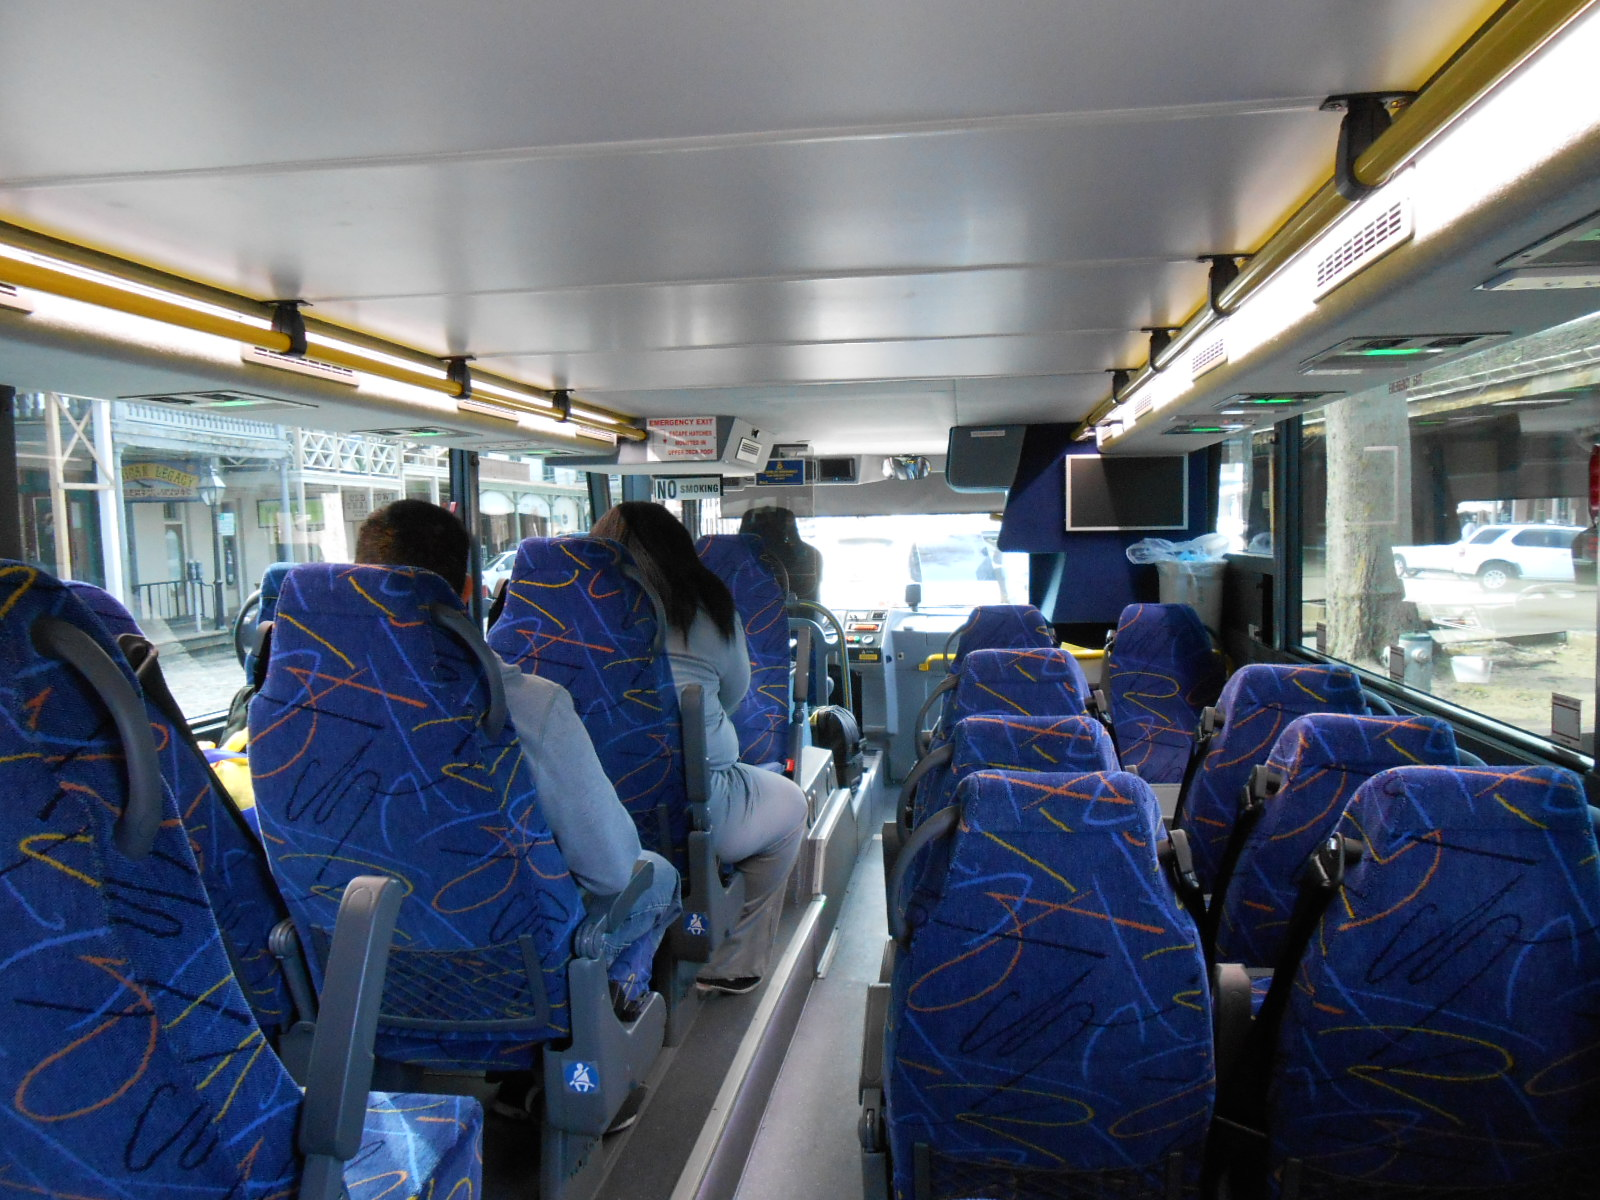 Megabus Double Decker Inside | www.imgkid.com - The Image ...